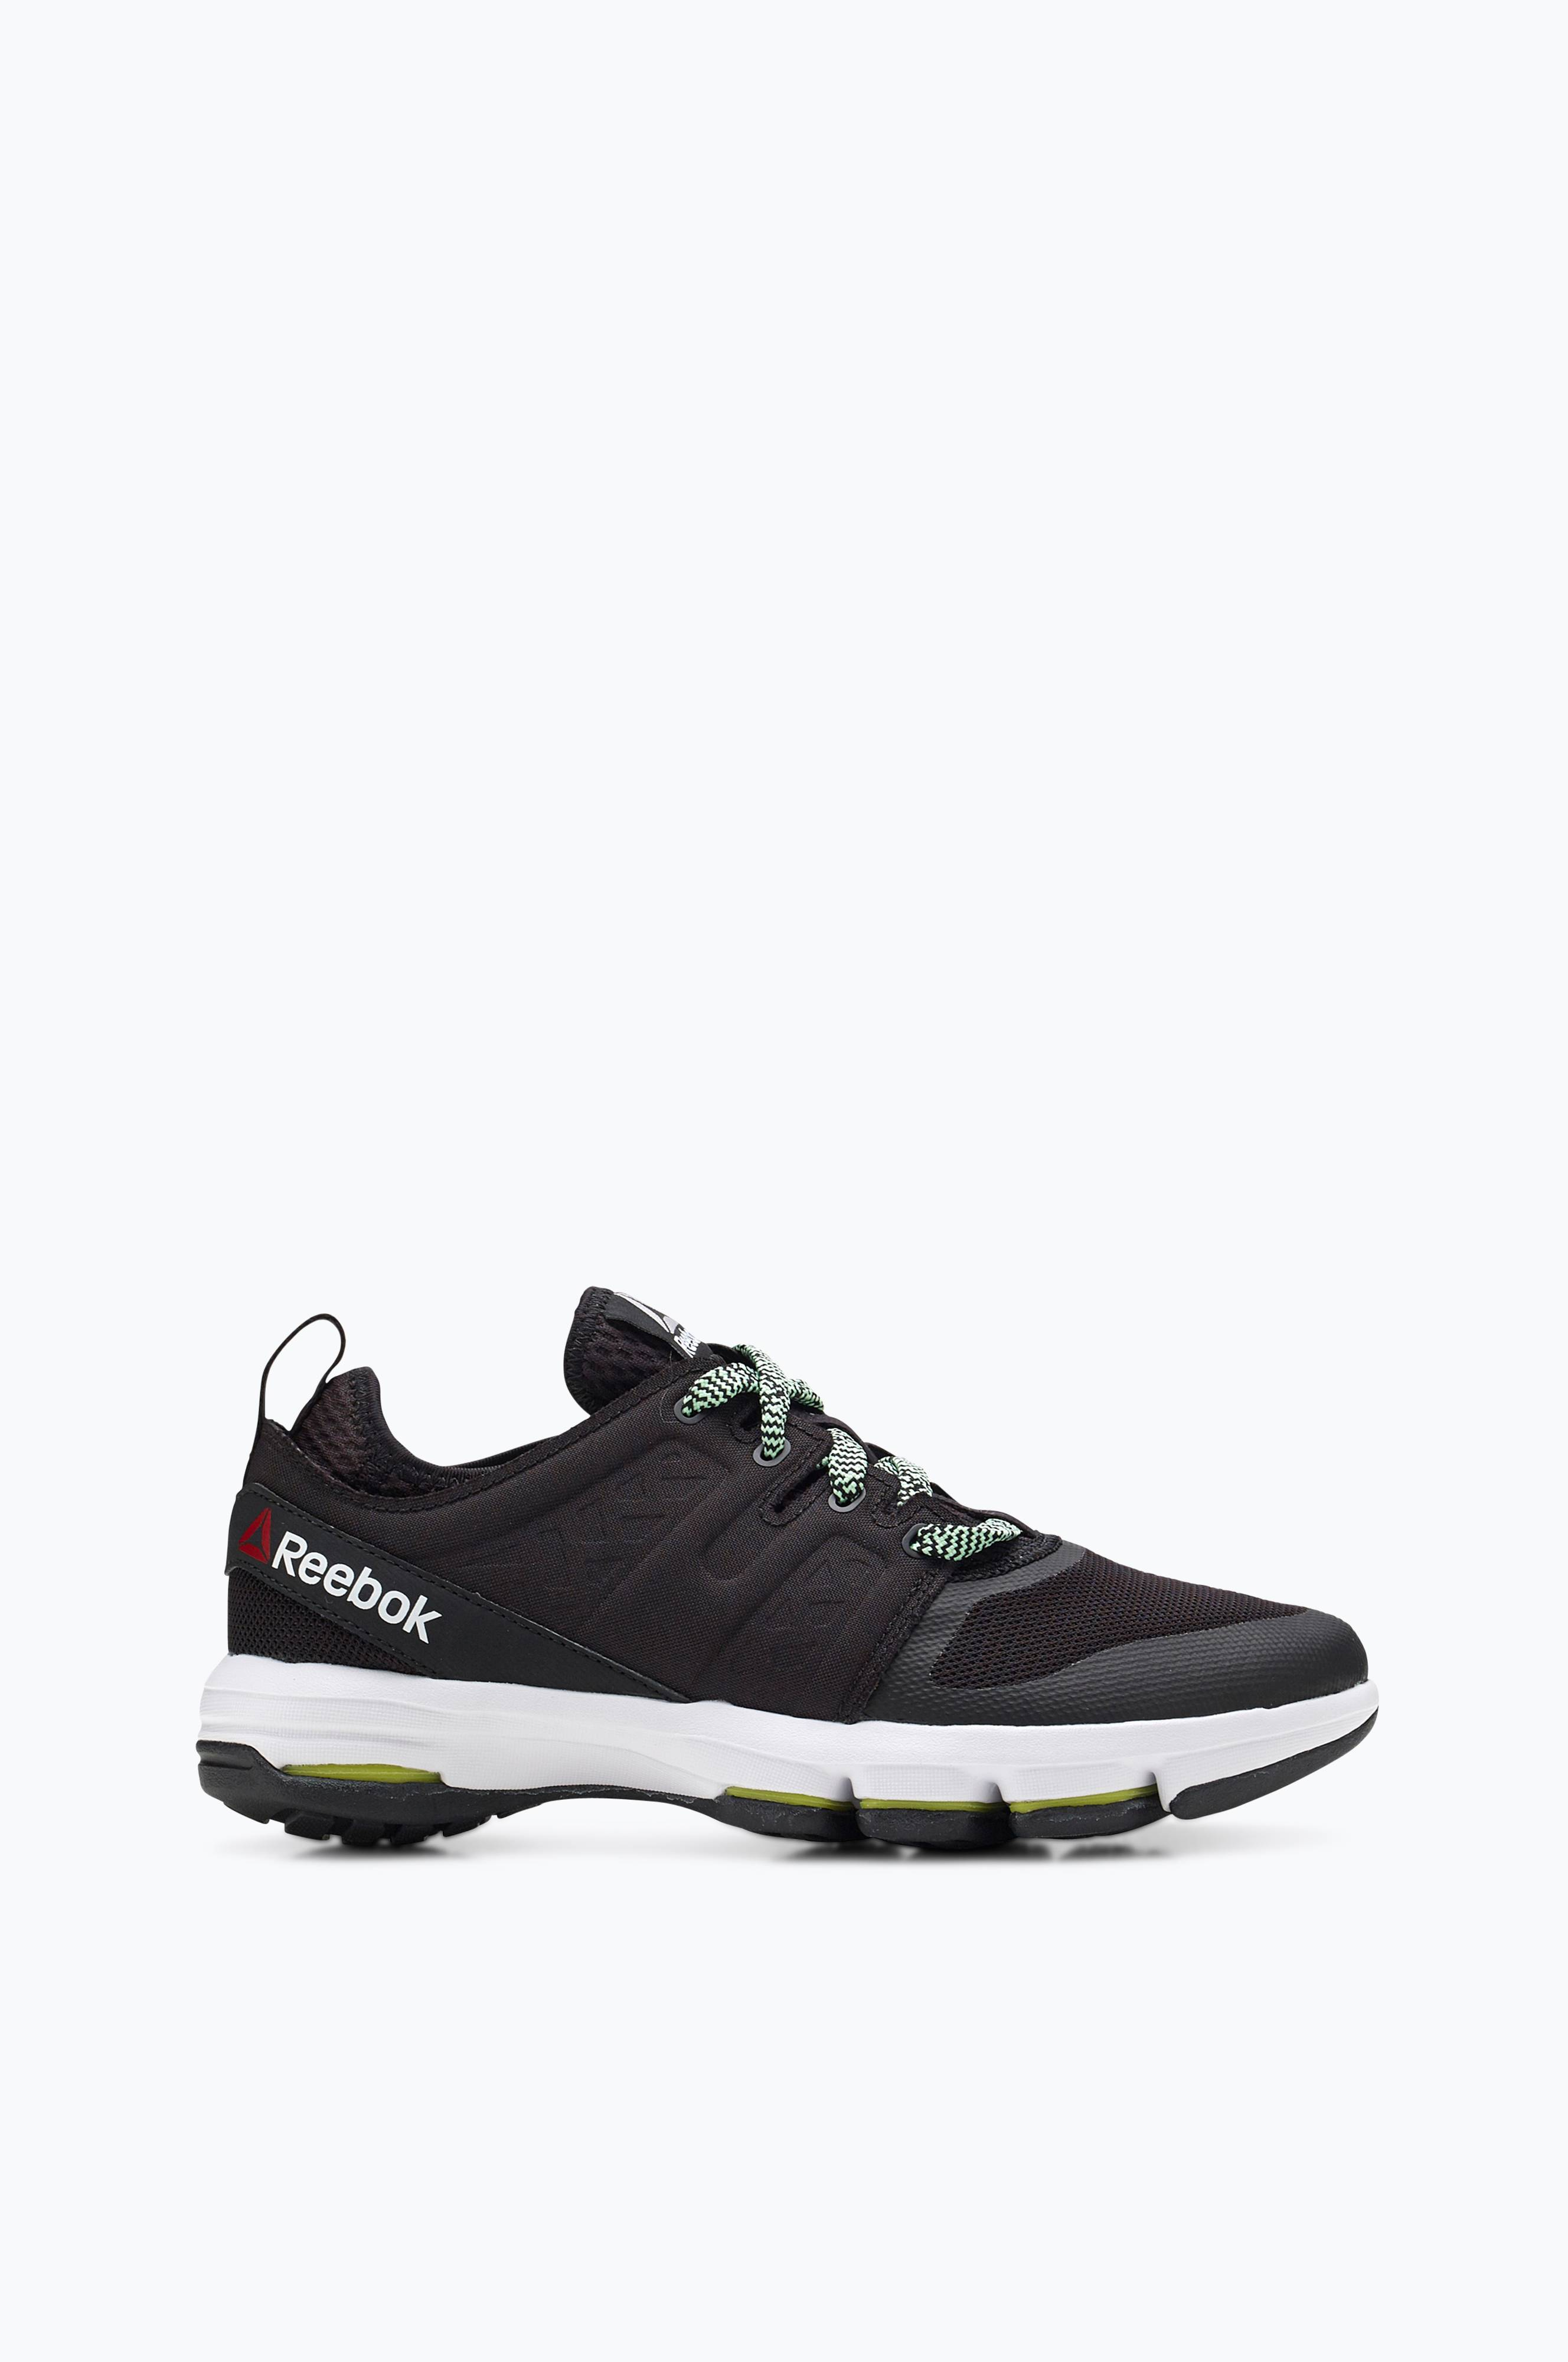 Reebok Men's Cloudride DMX Walking Shoes